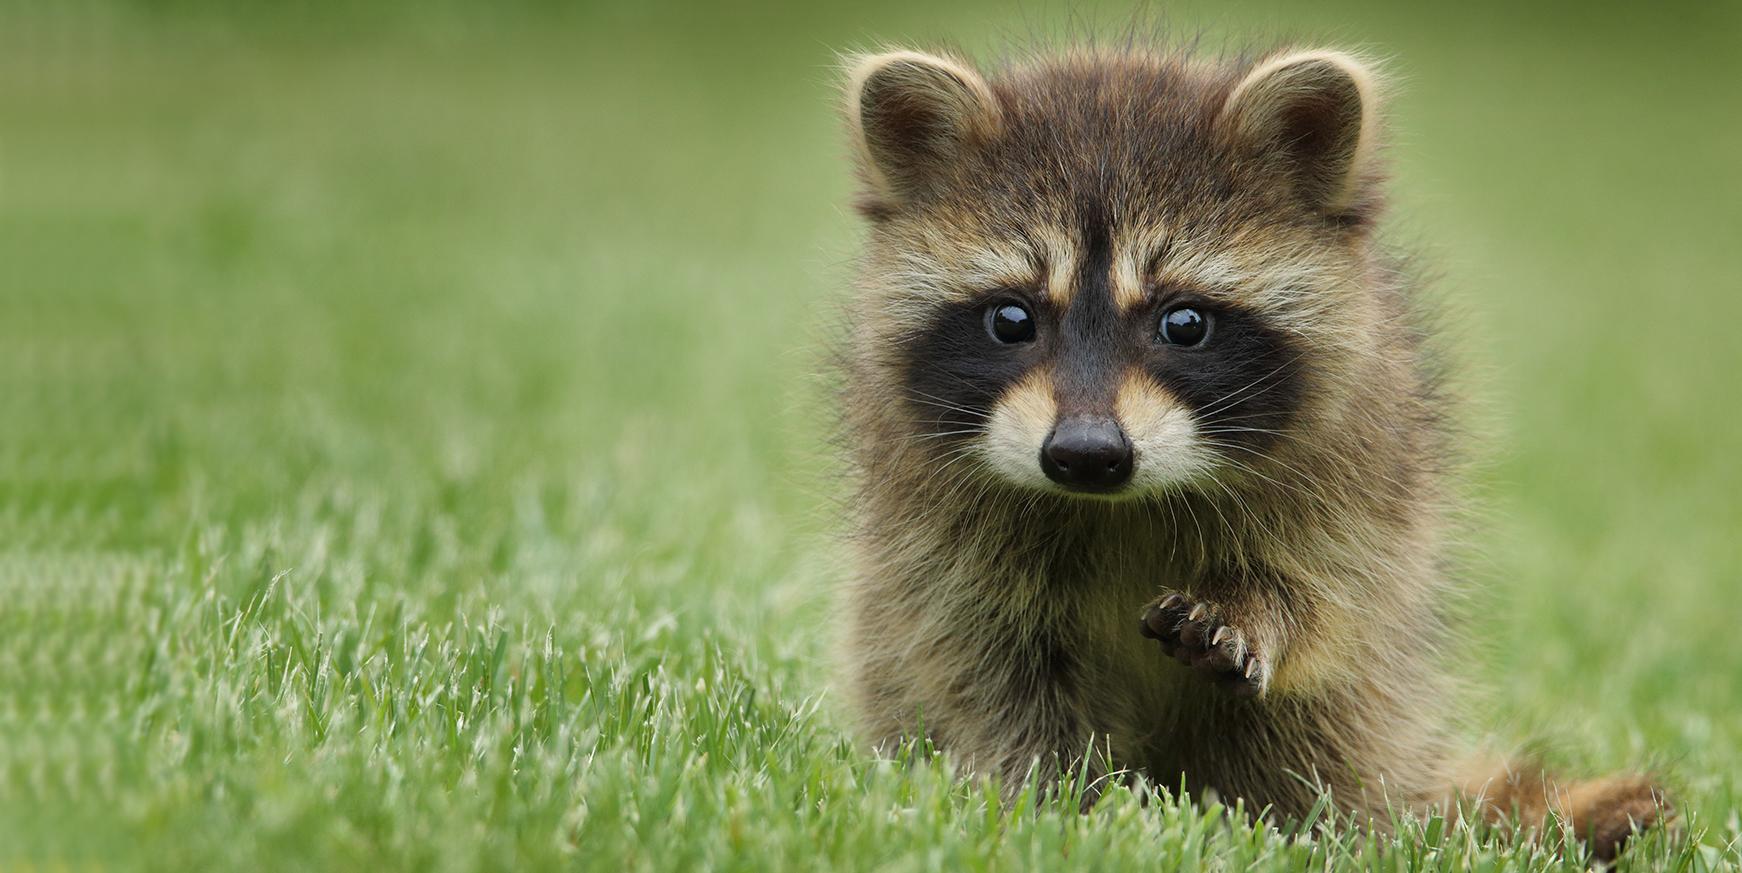 Baby raccoon walking on grass